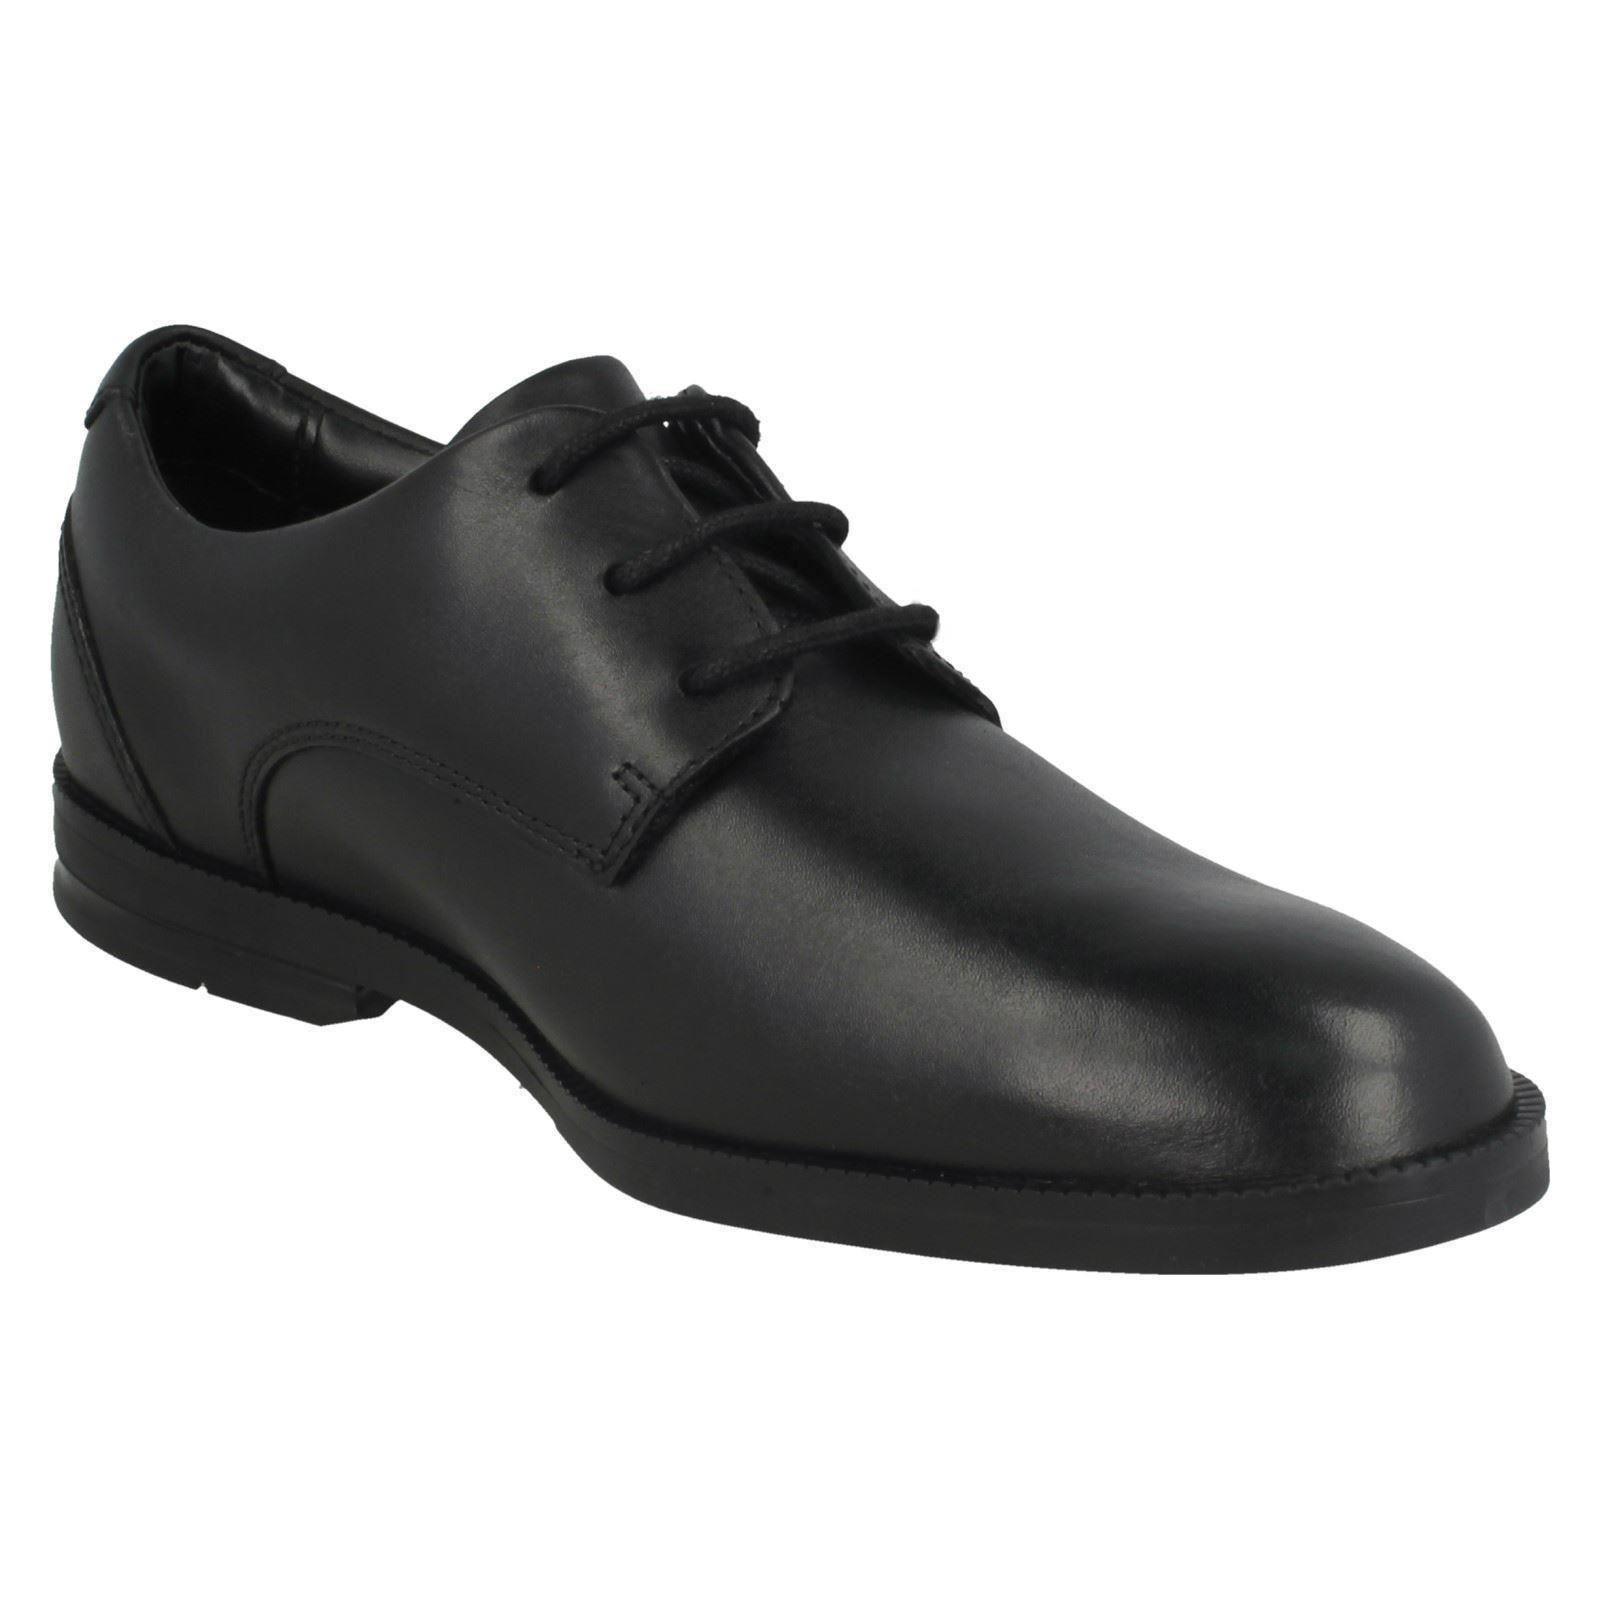 Clarks School Shoes 'Rufus Edge